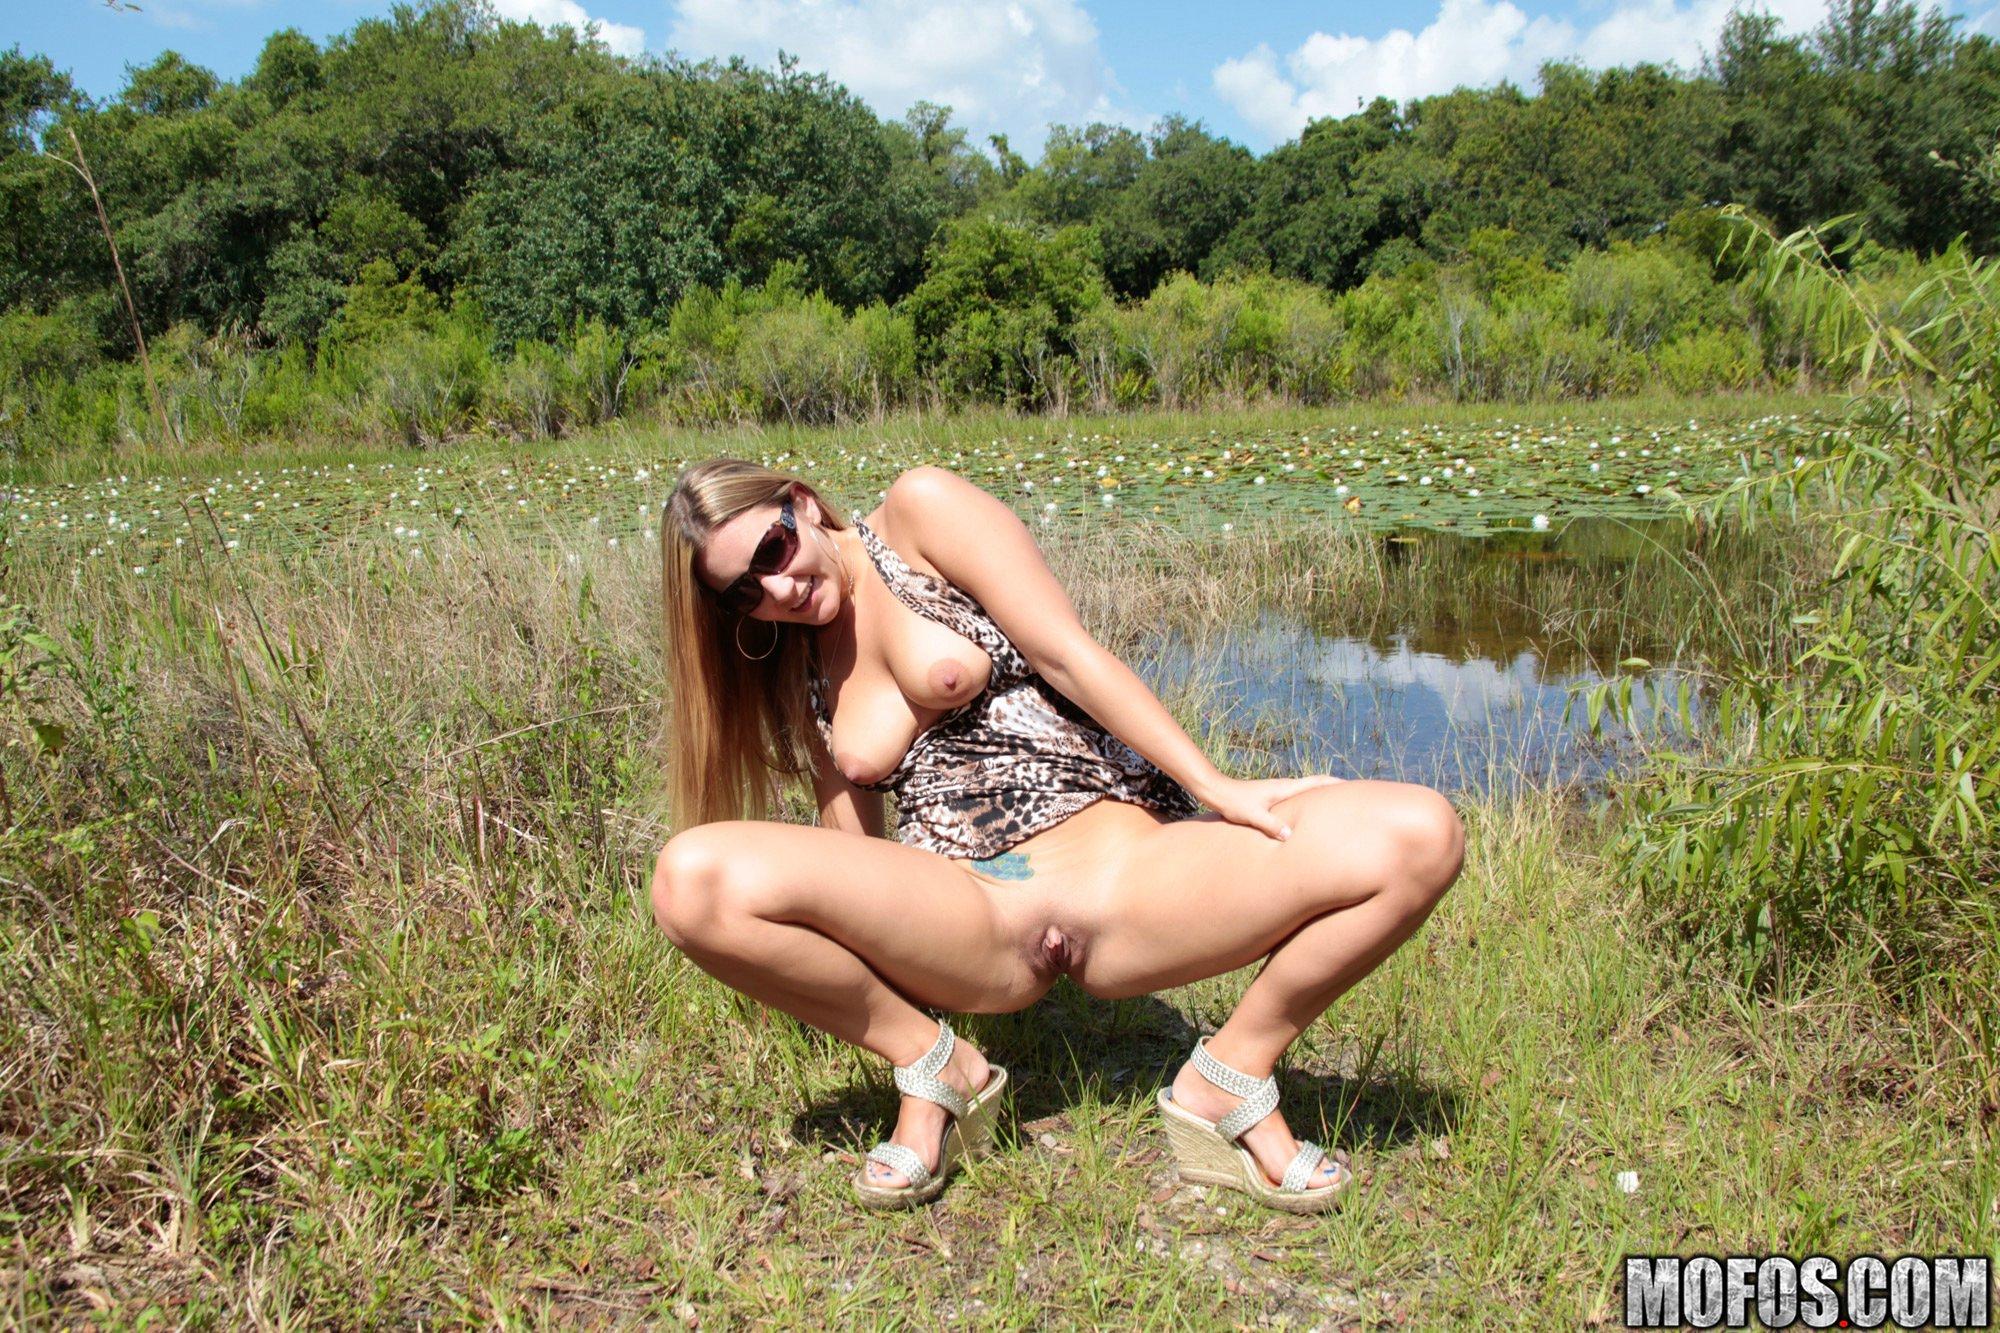 Carmen Knoxx - Take A Hike